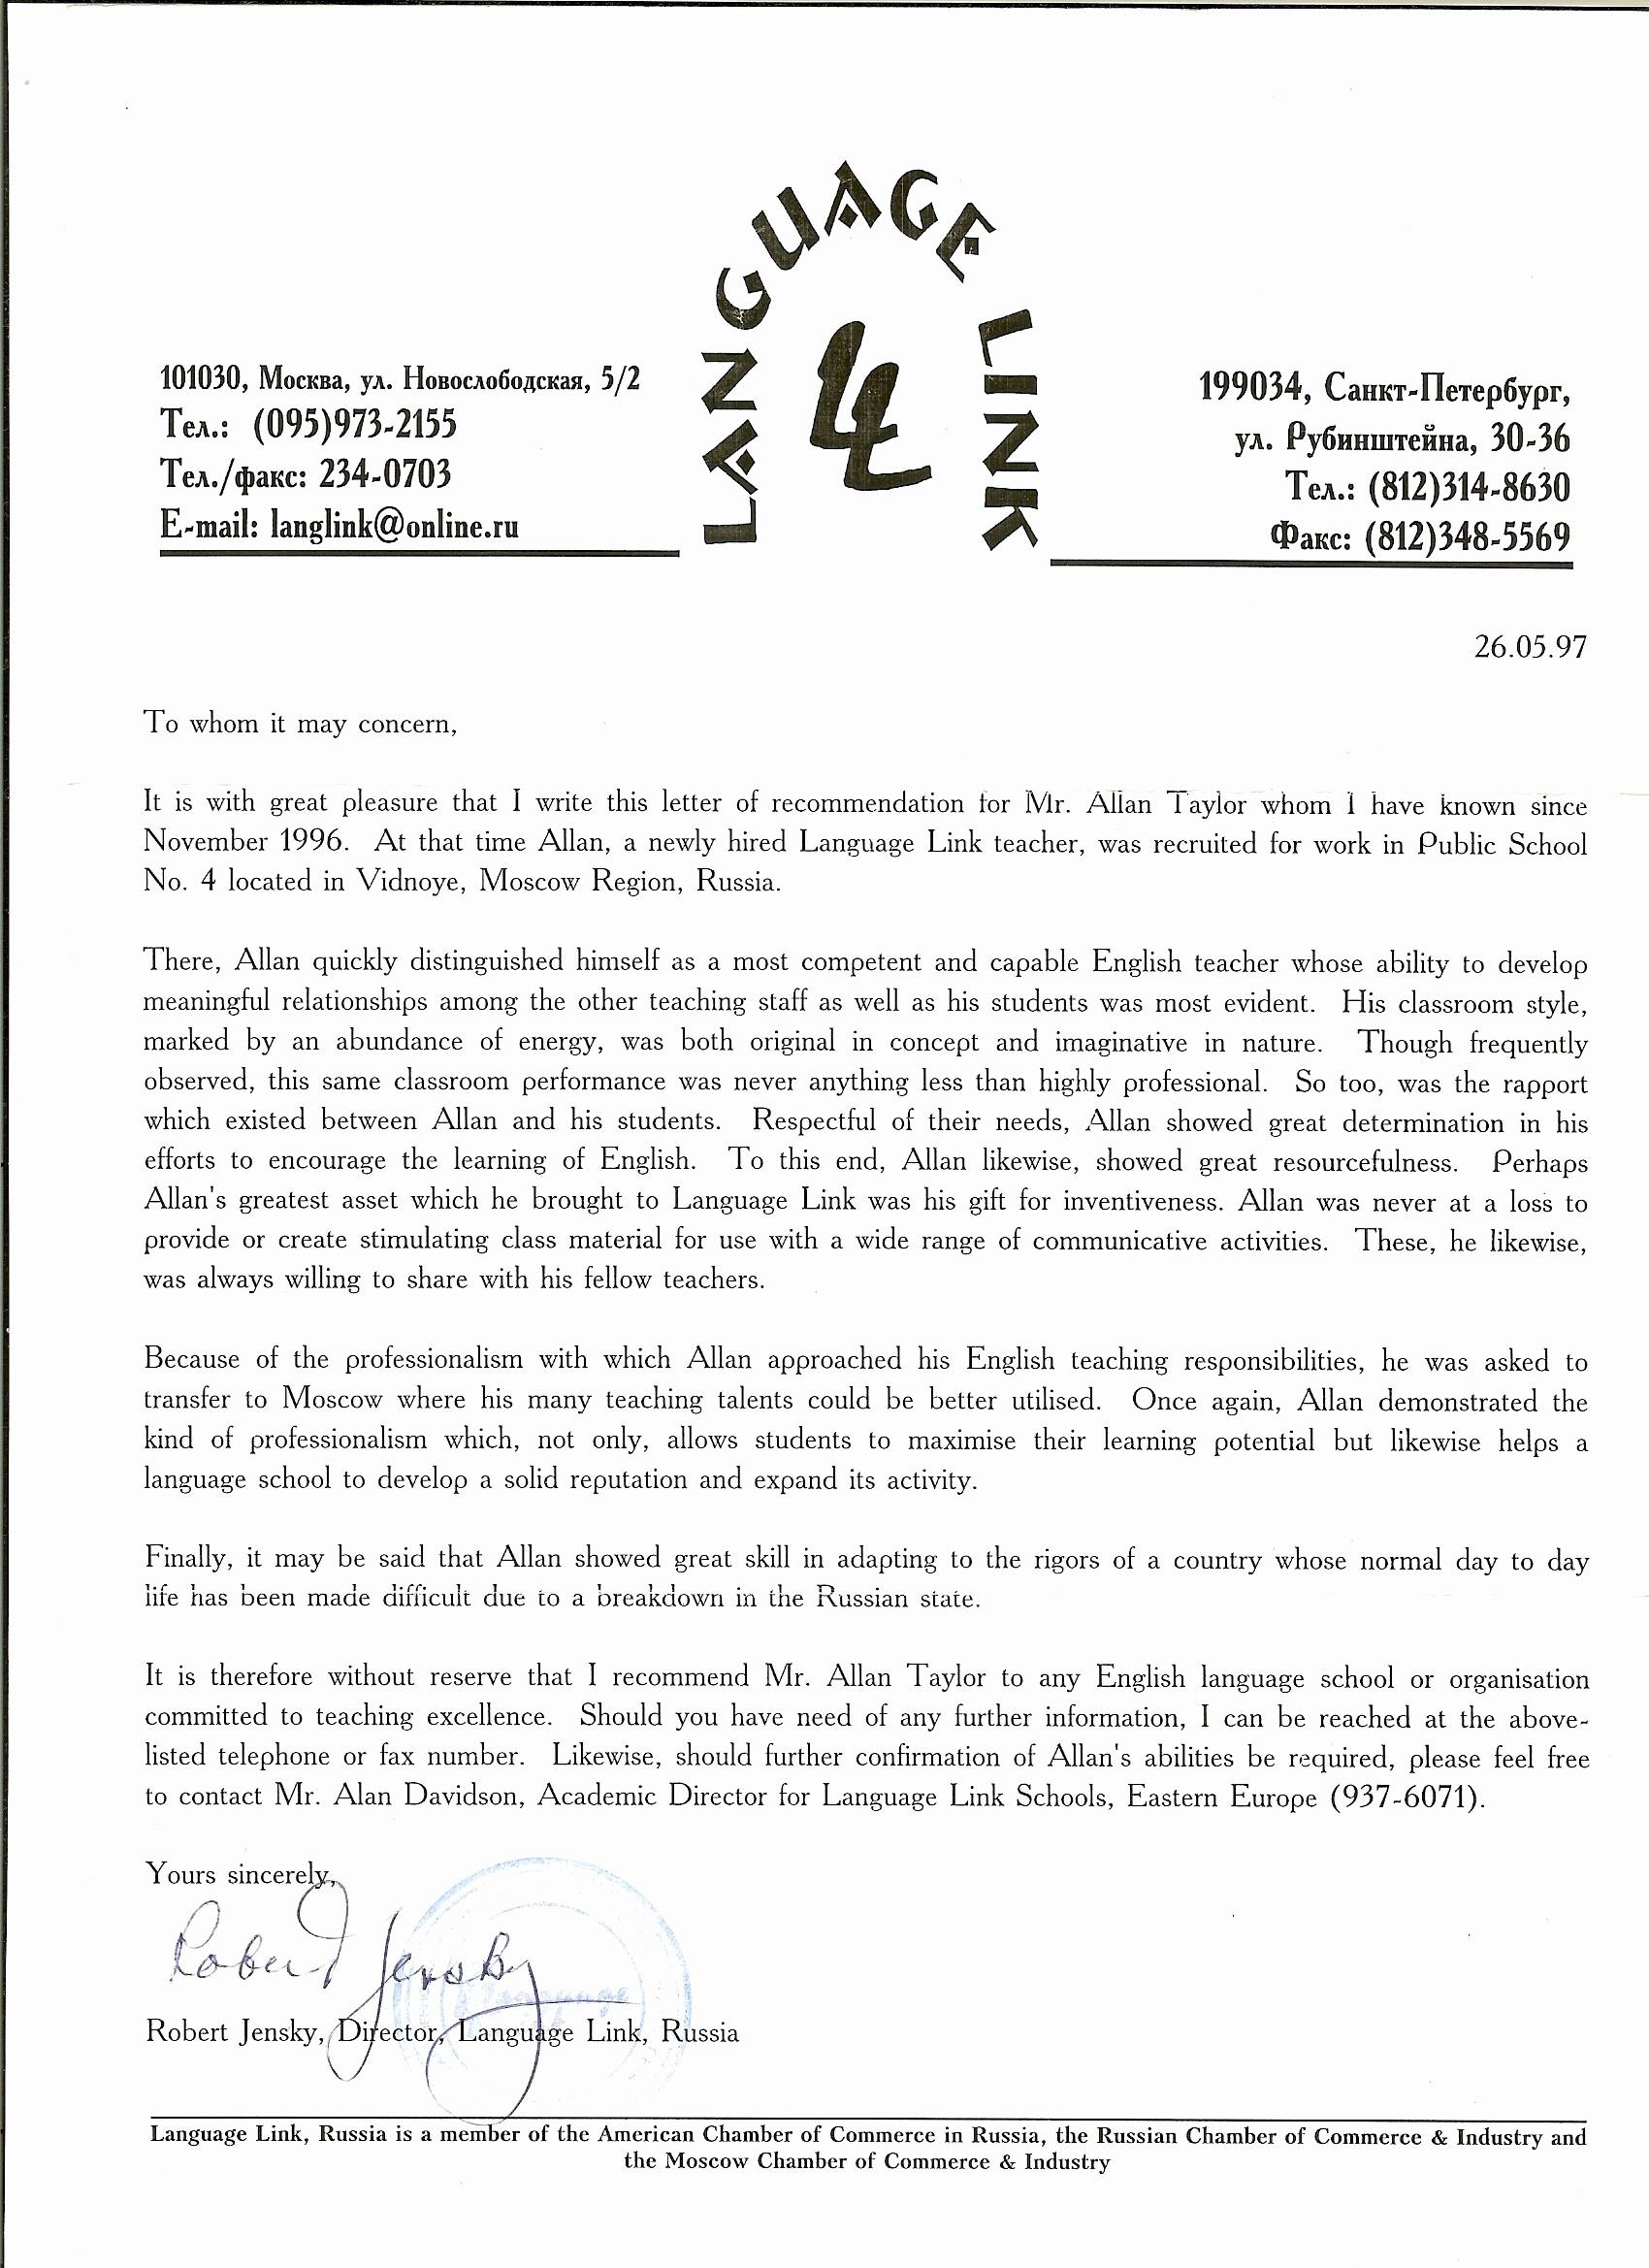 Reference Letter Sample for Teacher New Letter Re Mendation for Teaching English Abroad